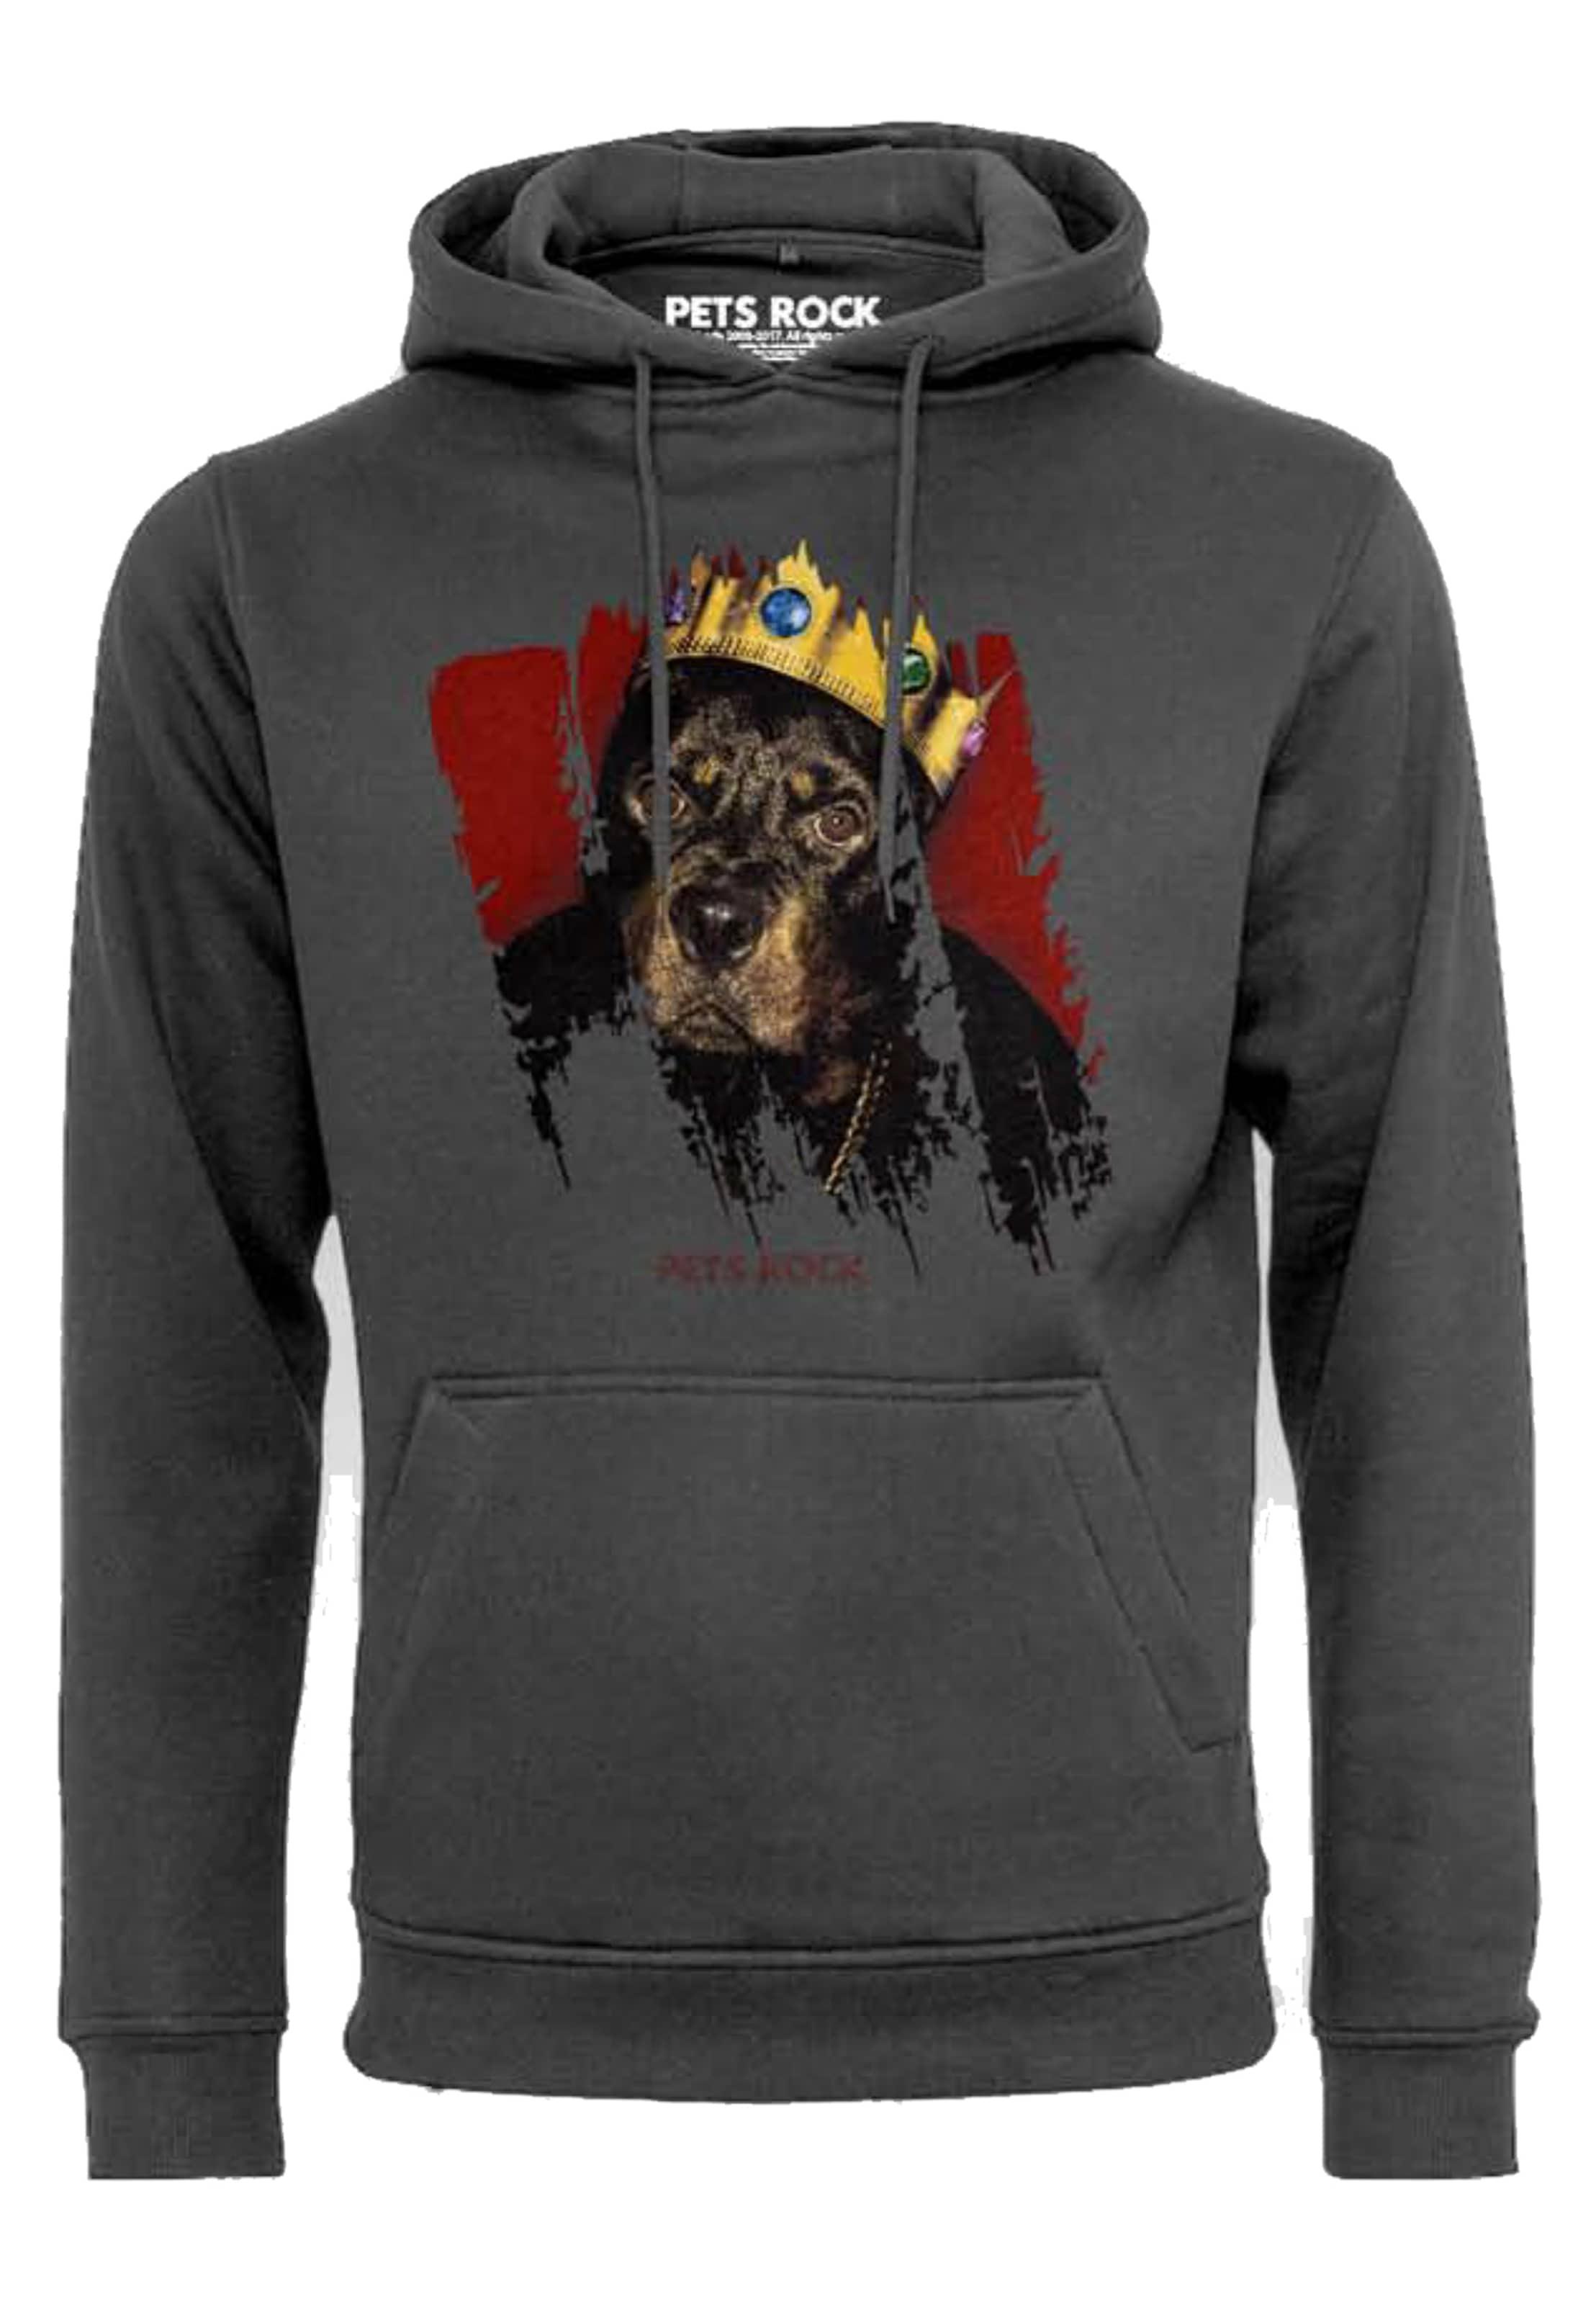 In Tee Mister Hoody 'petsrock Big Doggie' BasaltgrauMischfarben CxBdoe